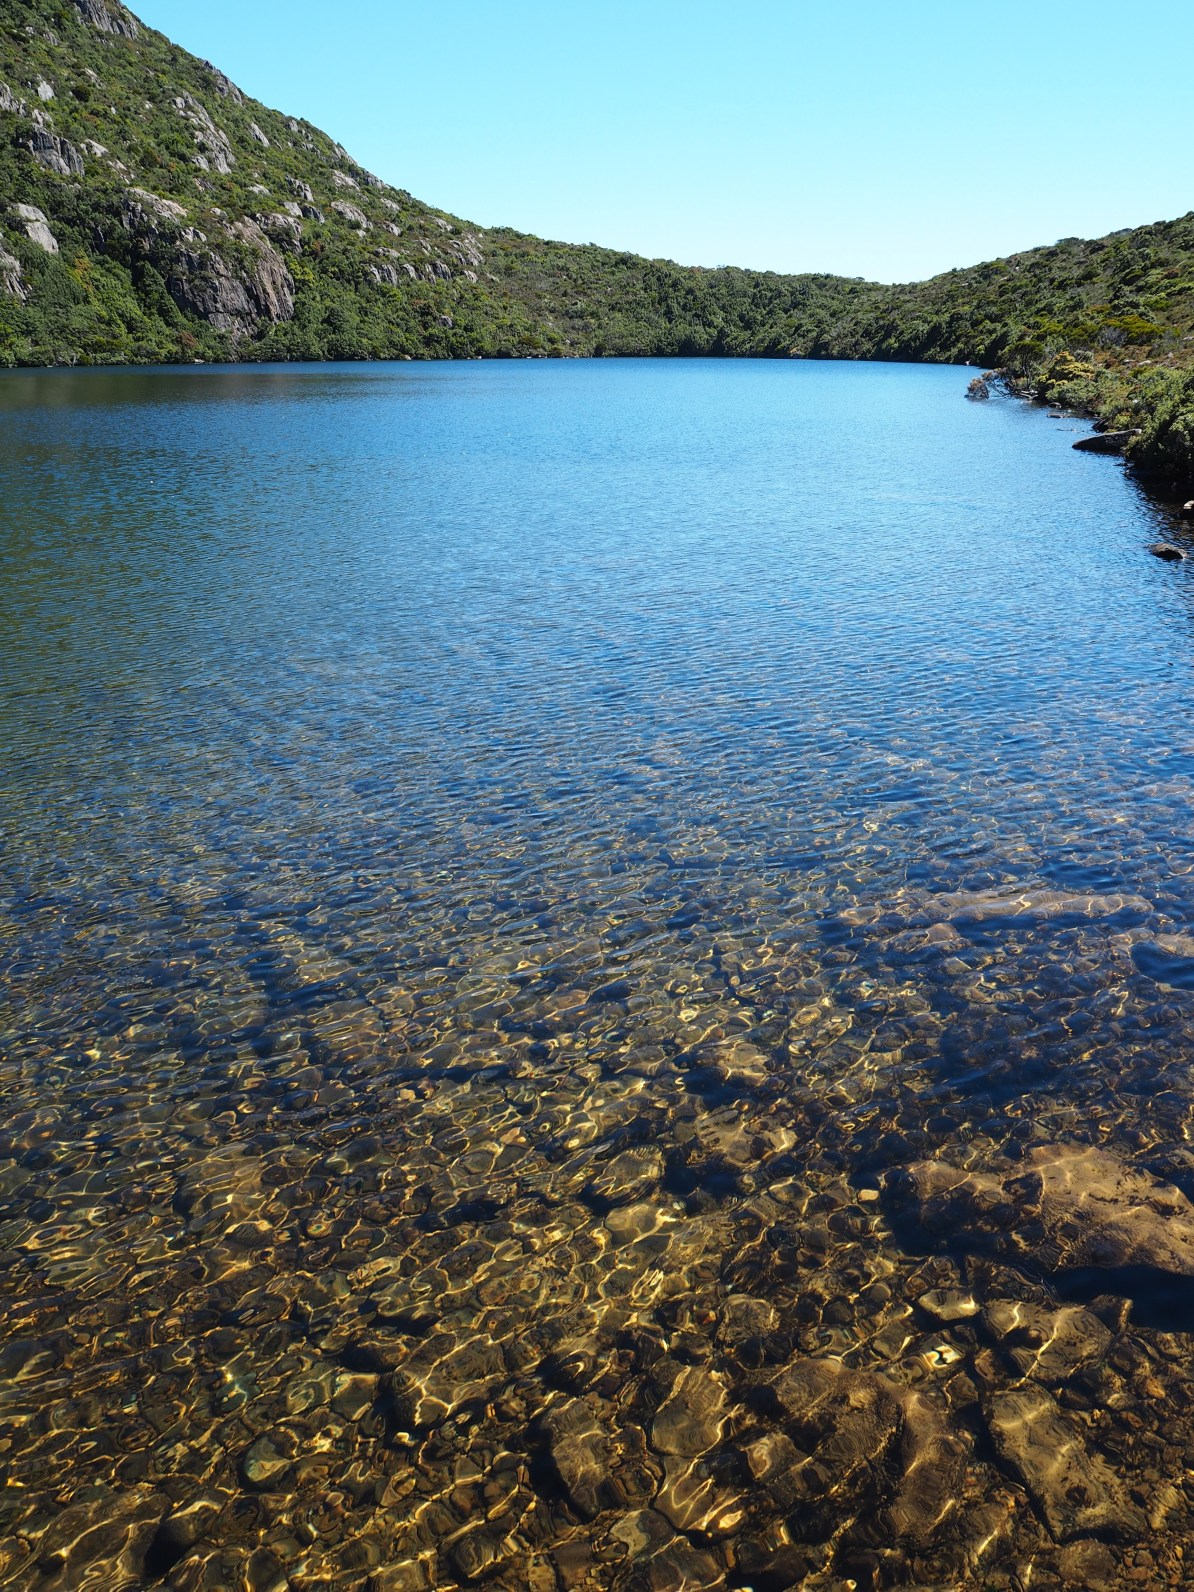 The beautiful Emerald Lake.